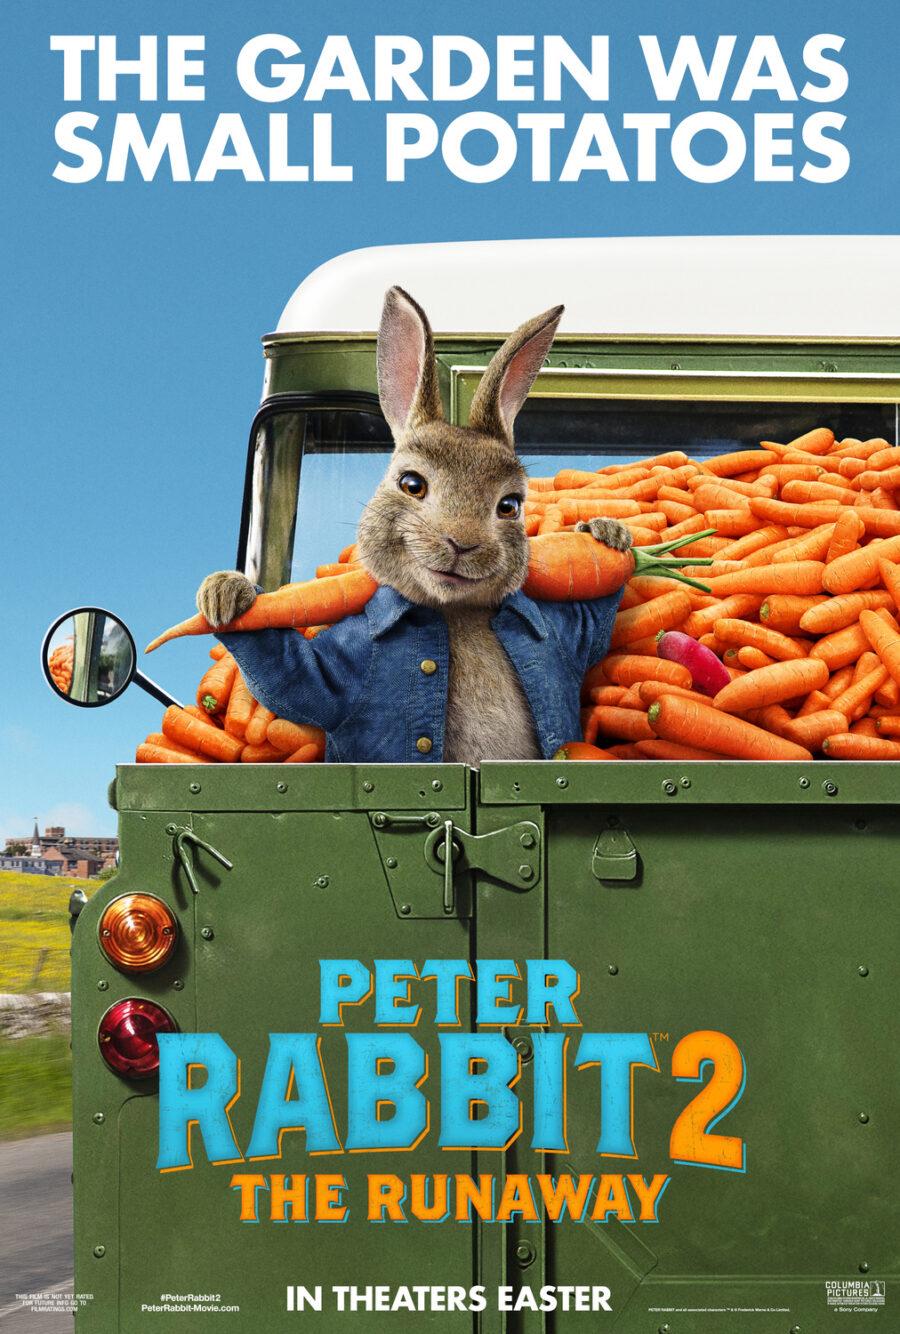 Family movie sequel